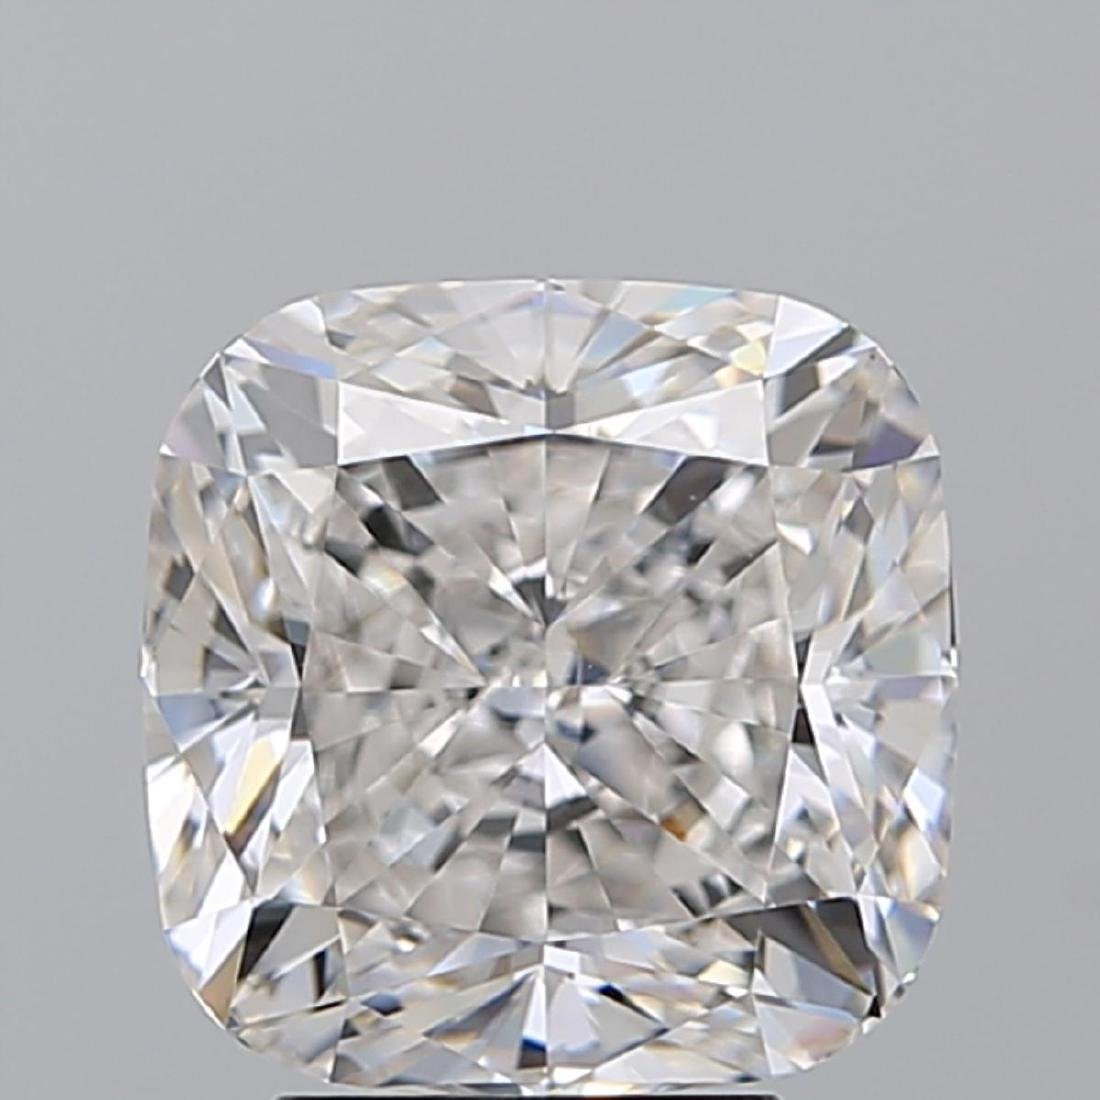 3.77 ct, Color G/VS1, Cushion cut Diamond - 2